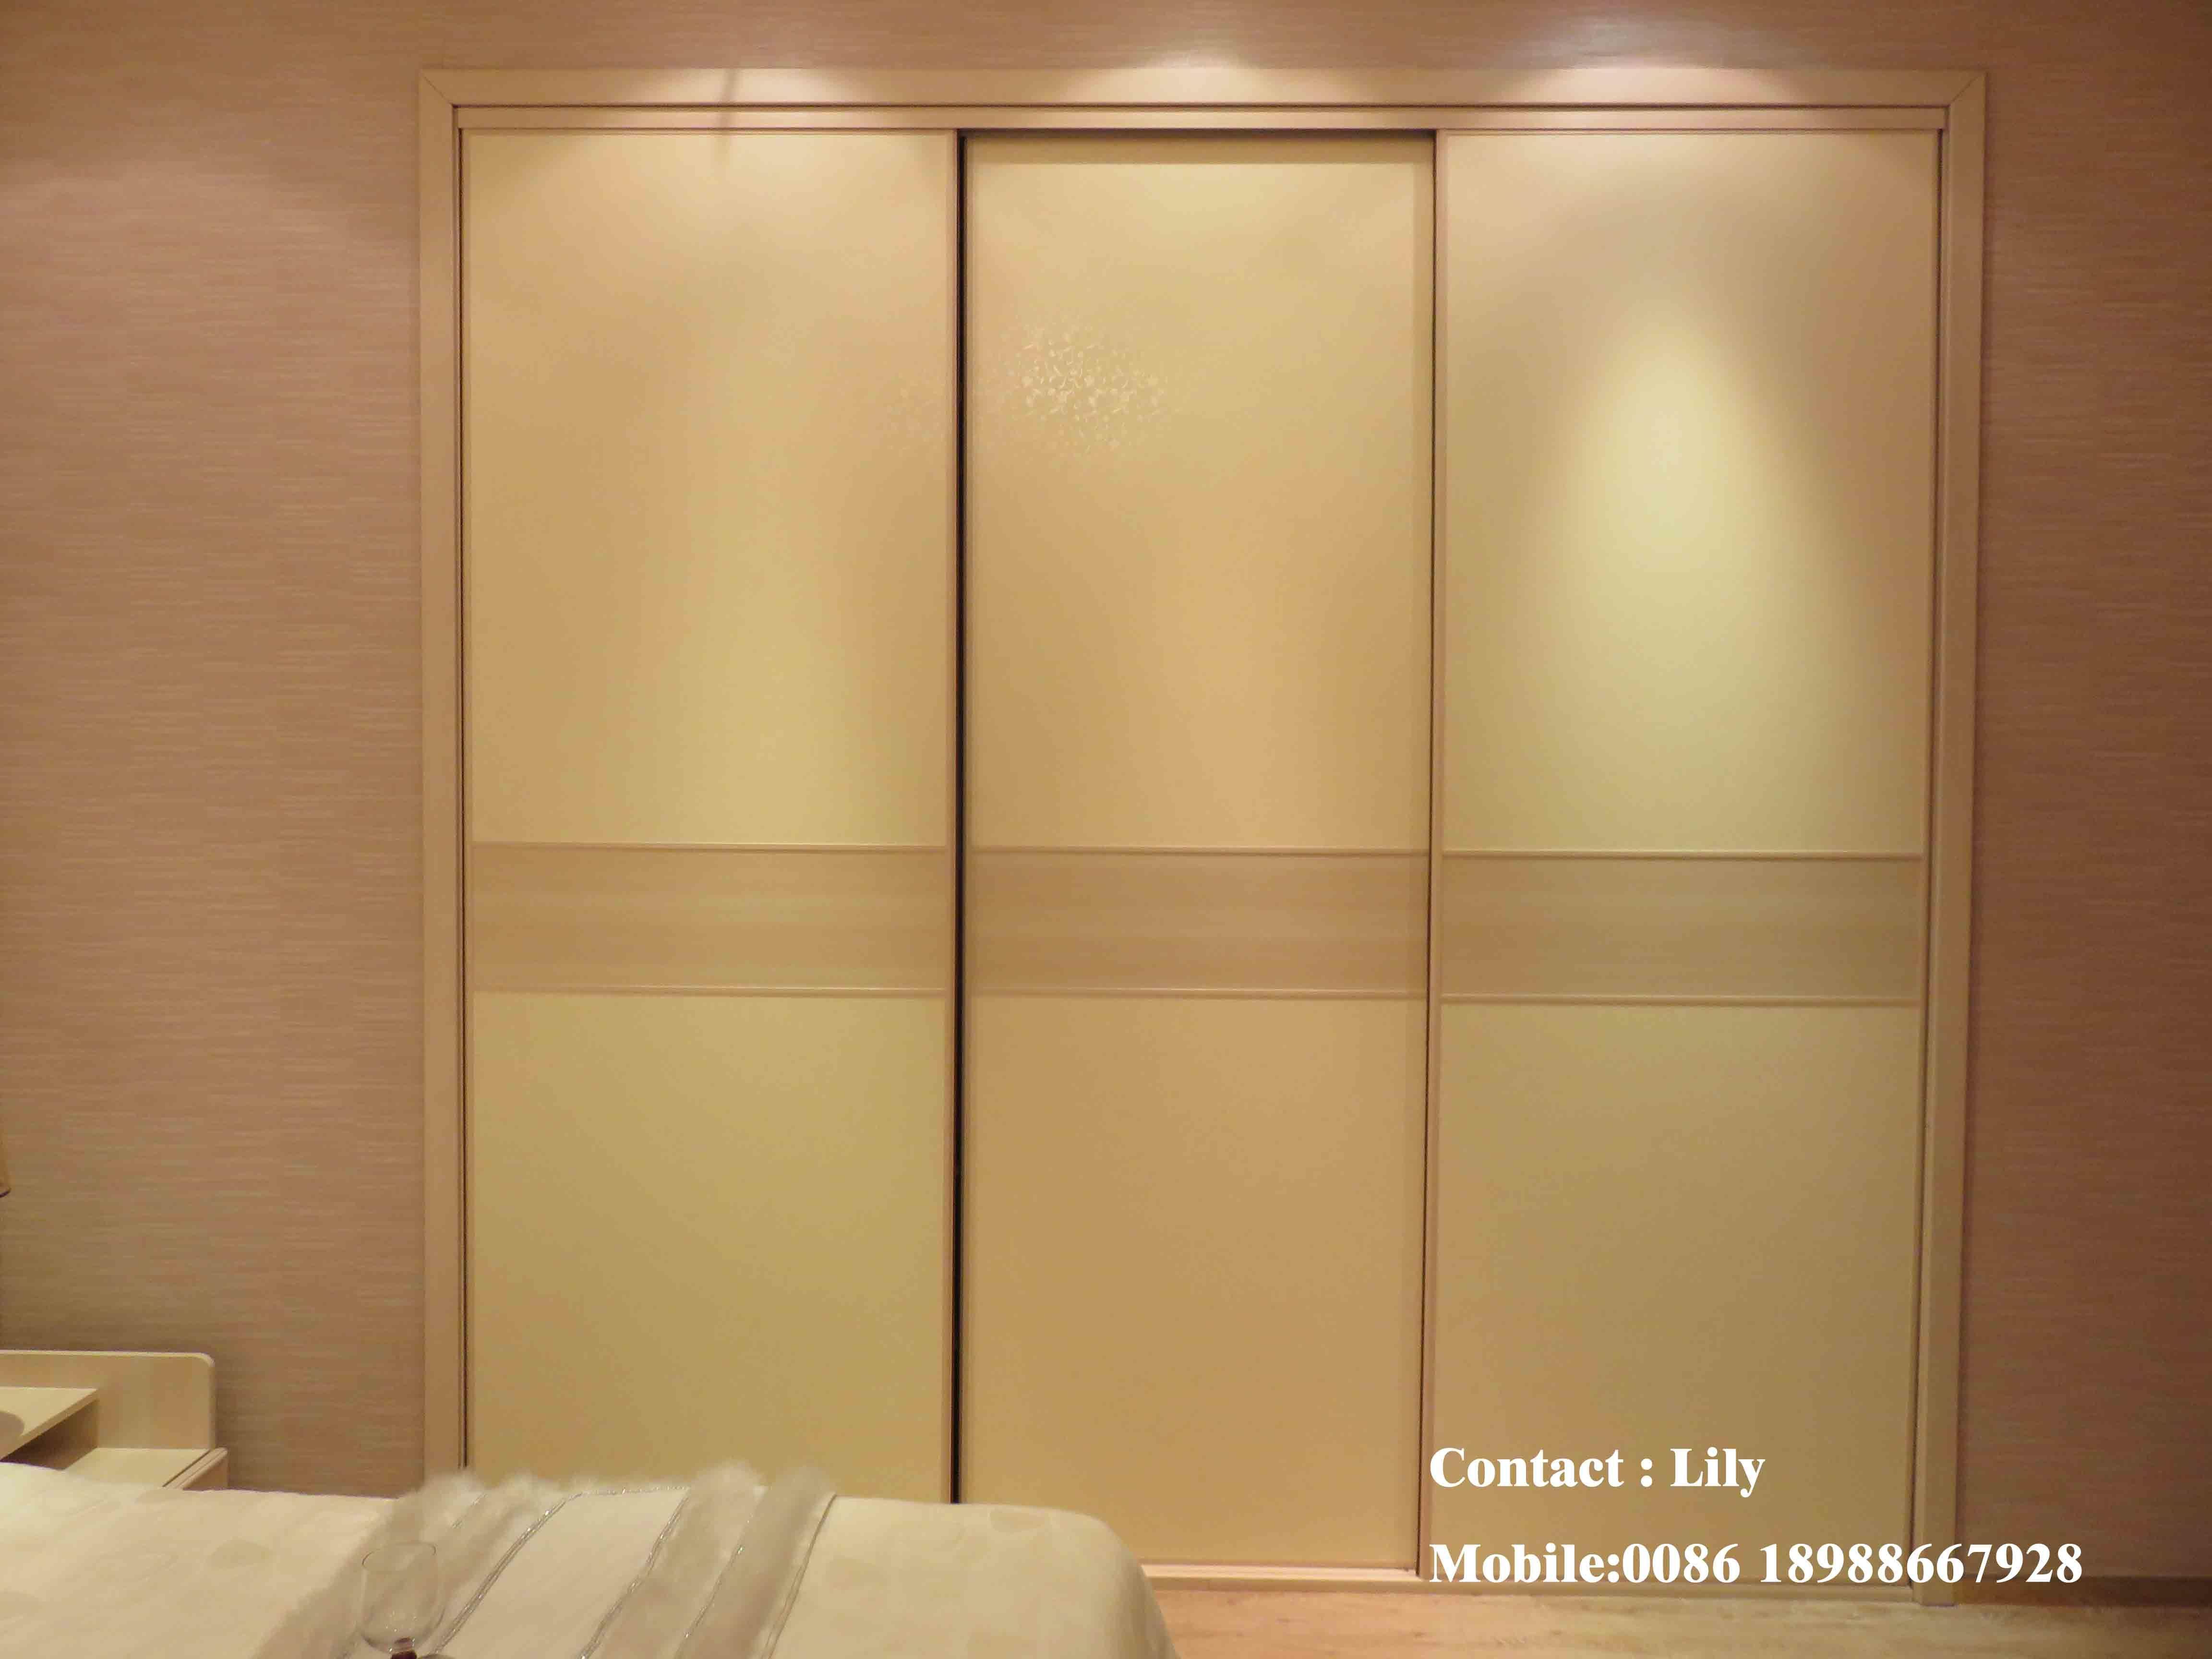 wardrobe closet ccmsow metal with diamond lock key mirror stock safe sofa door ds availability entry in